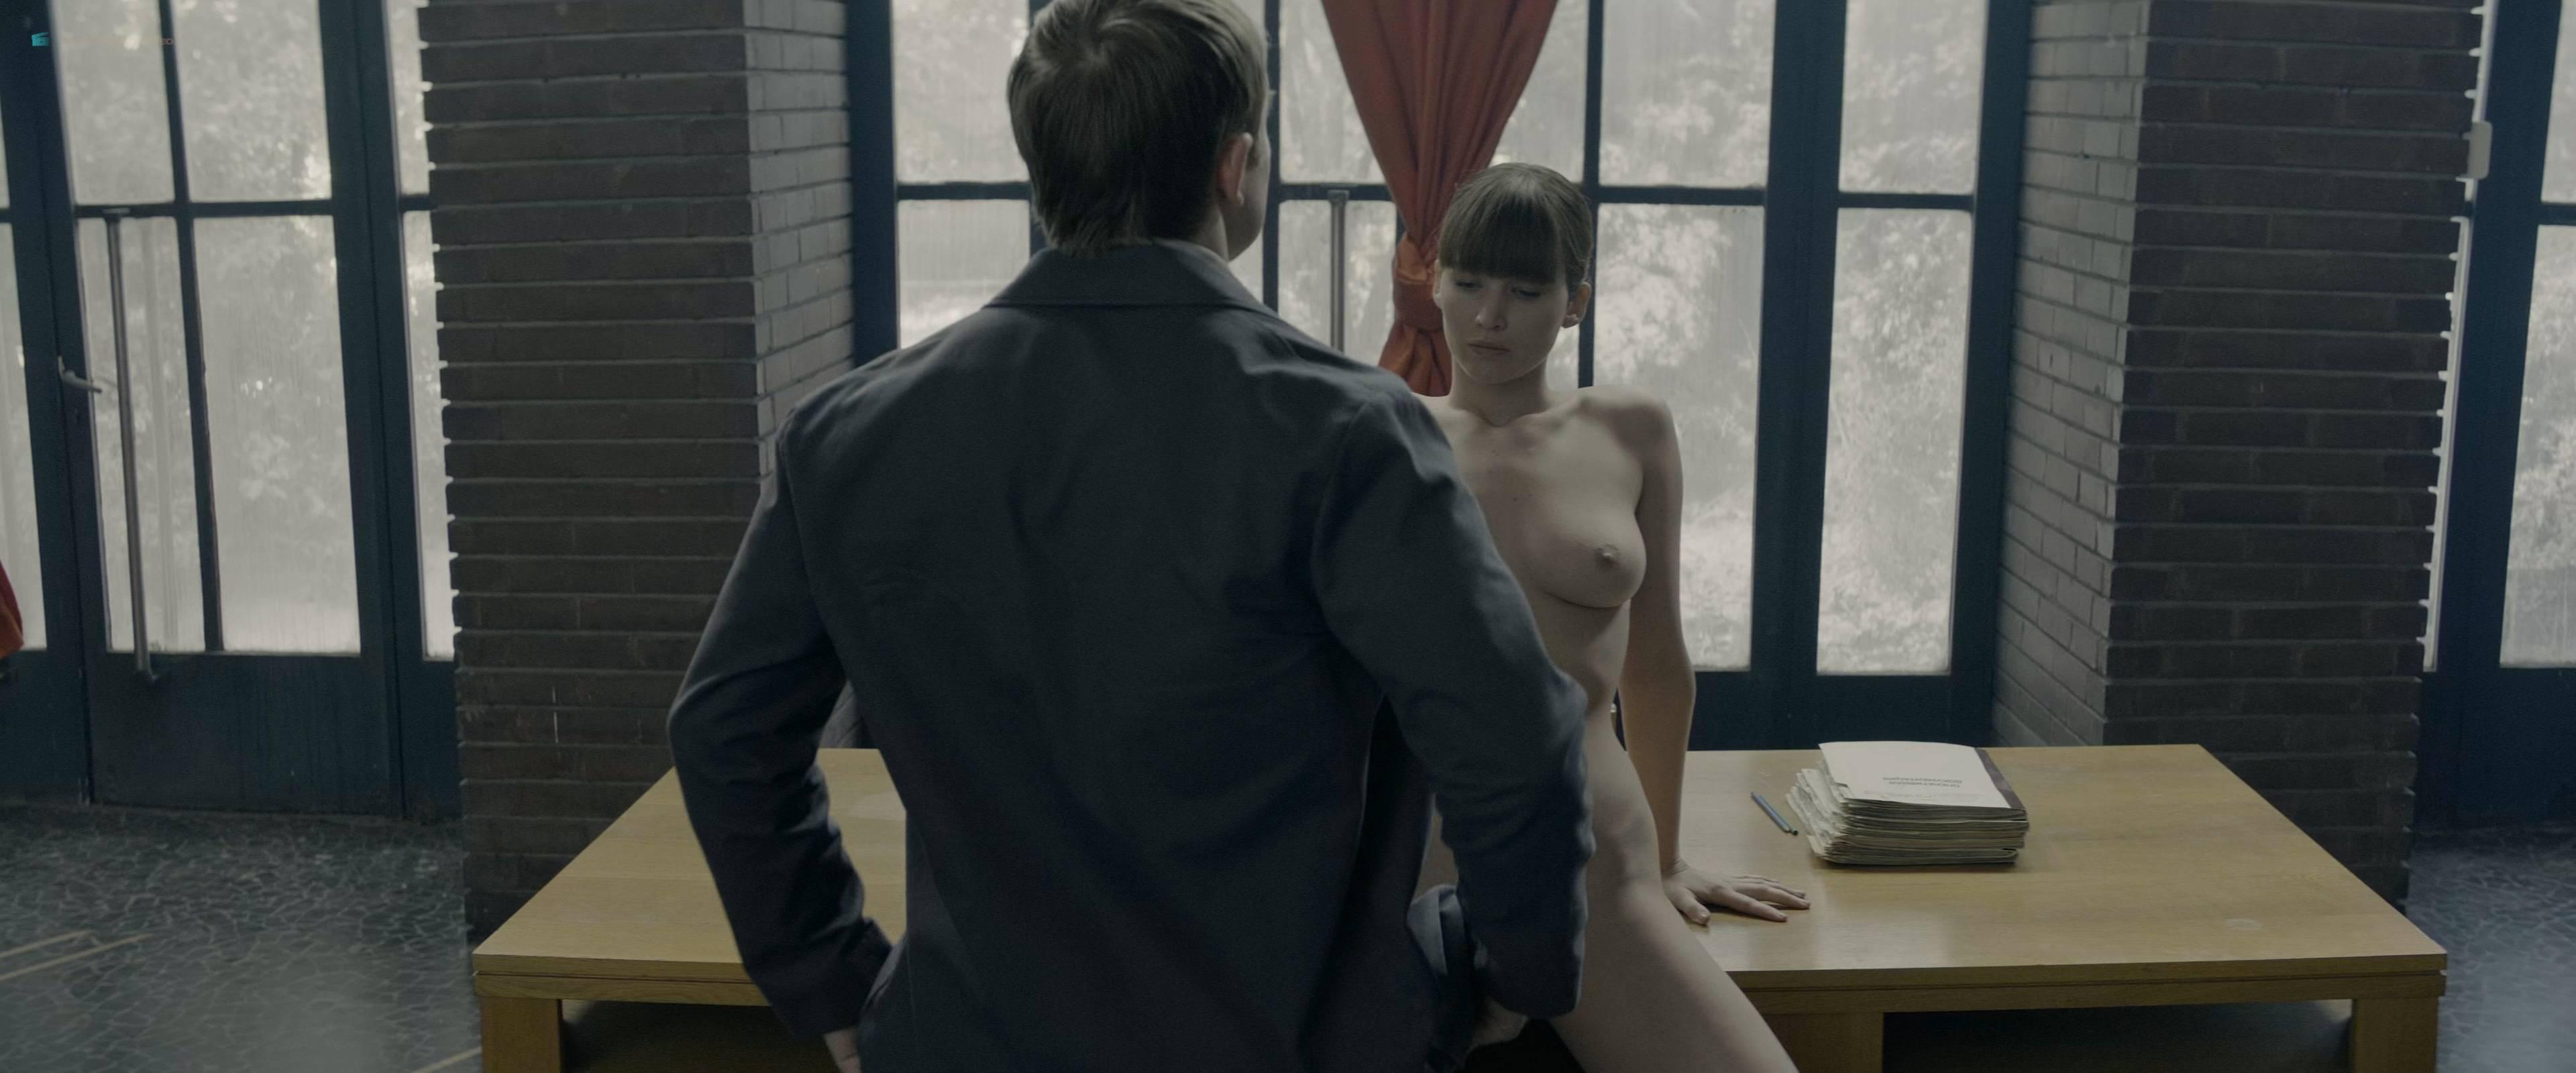 Jennifer heidrich nude